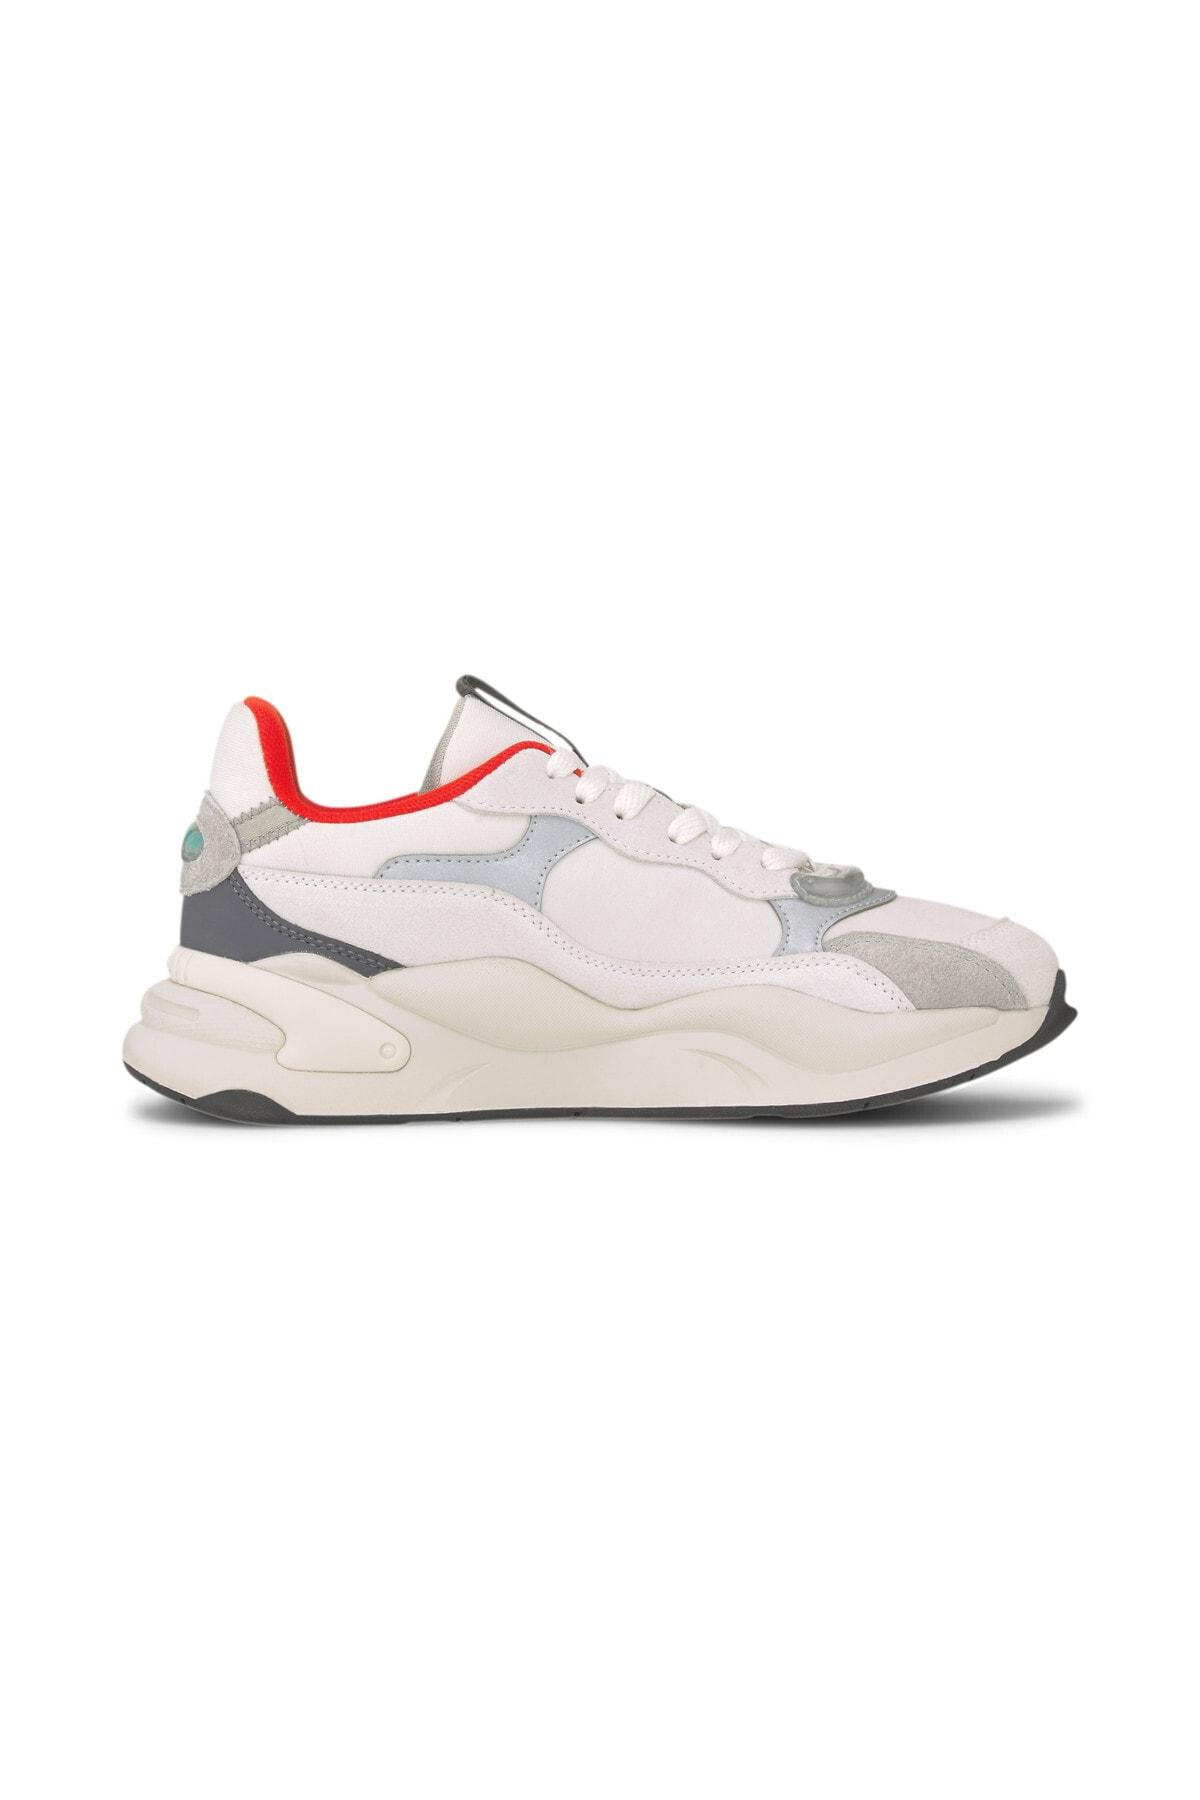 Puma X Attèmpt Rs-2k Ayakkabı 4